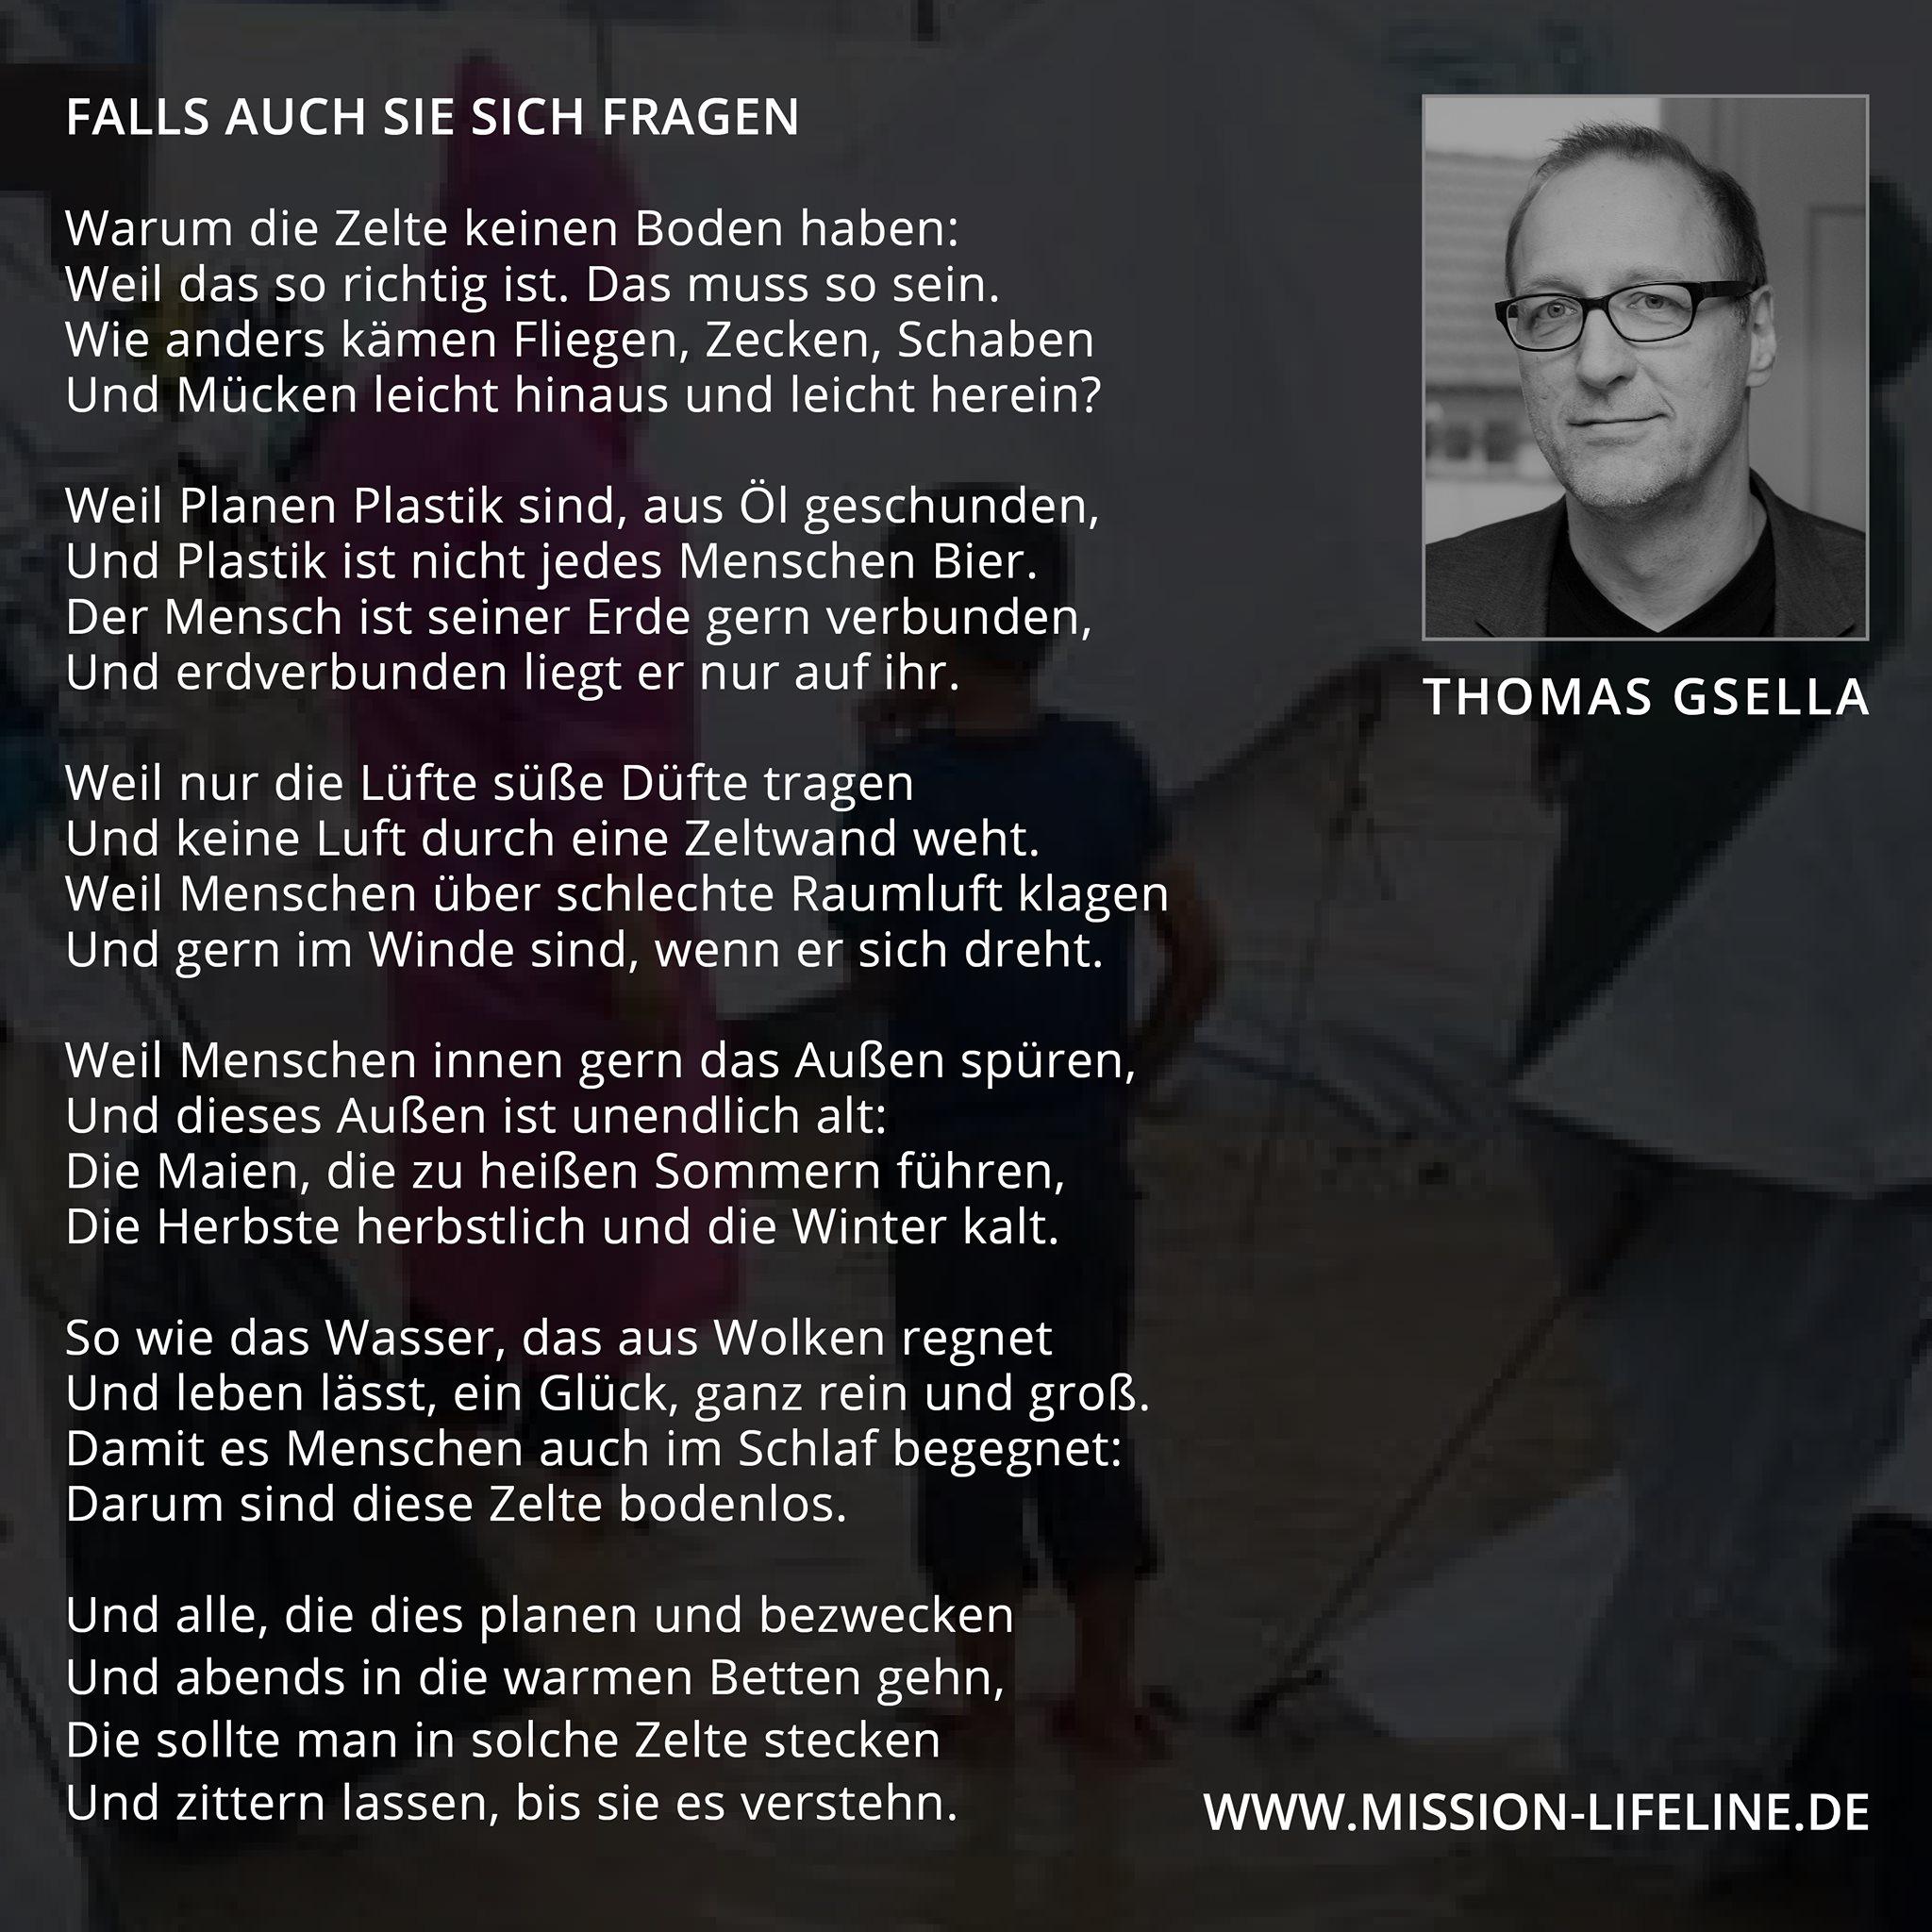 Gsella